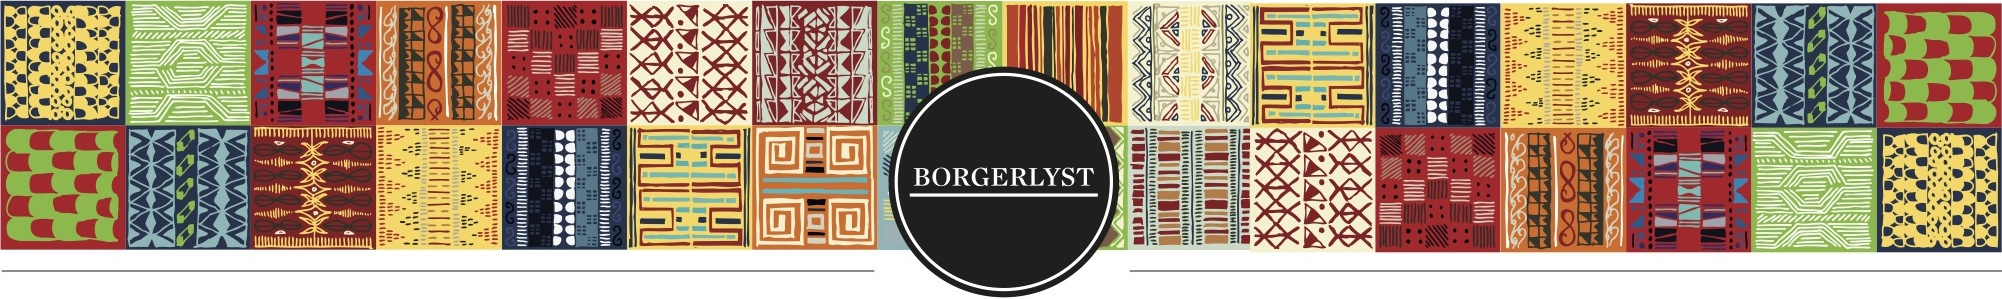 Borgerlyst